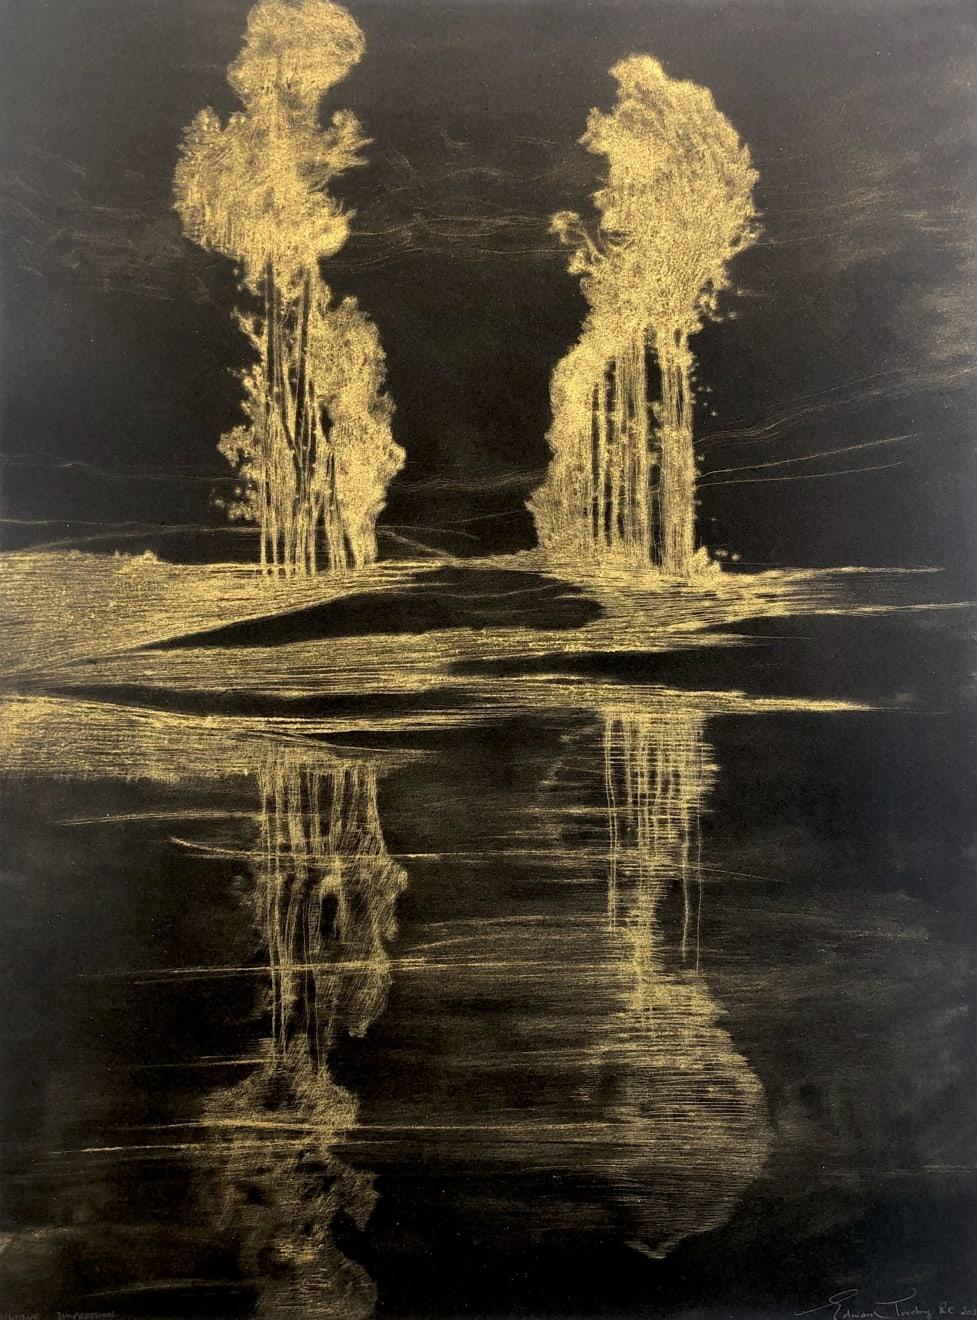 Summer Auction 2020, LOT 137 - Edward Twohig - 'Untitled', 2020